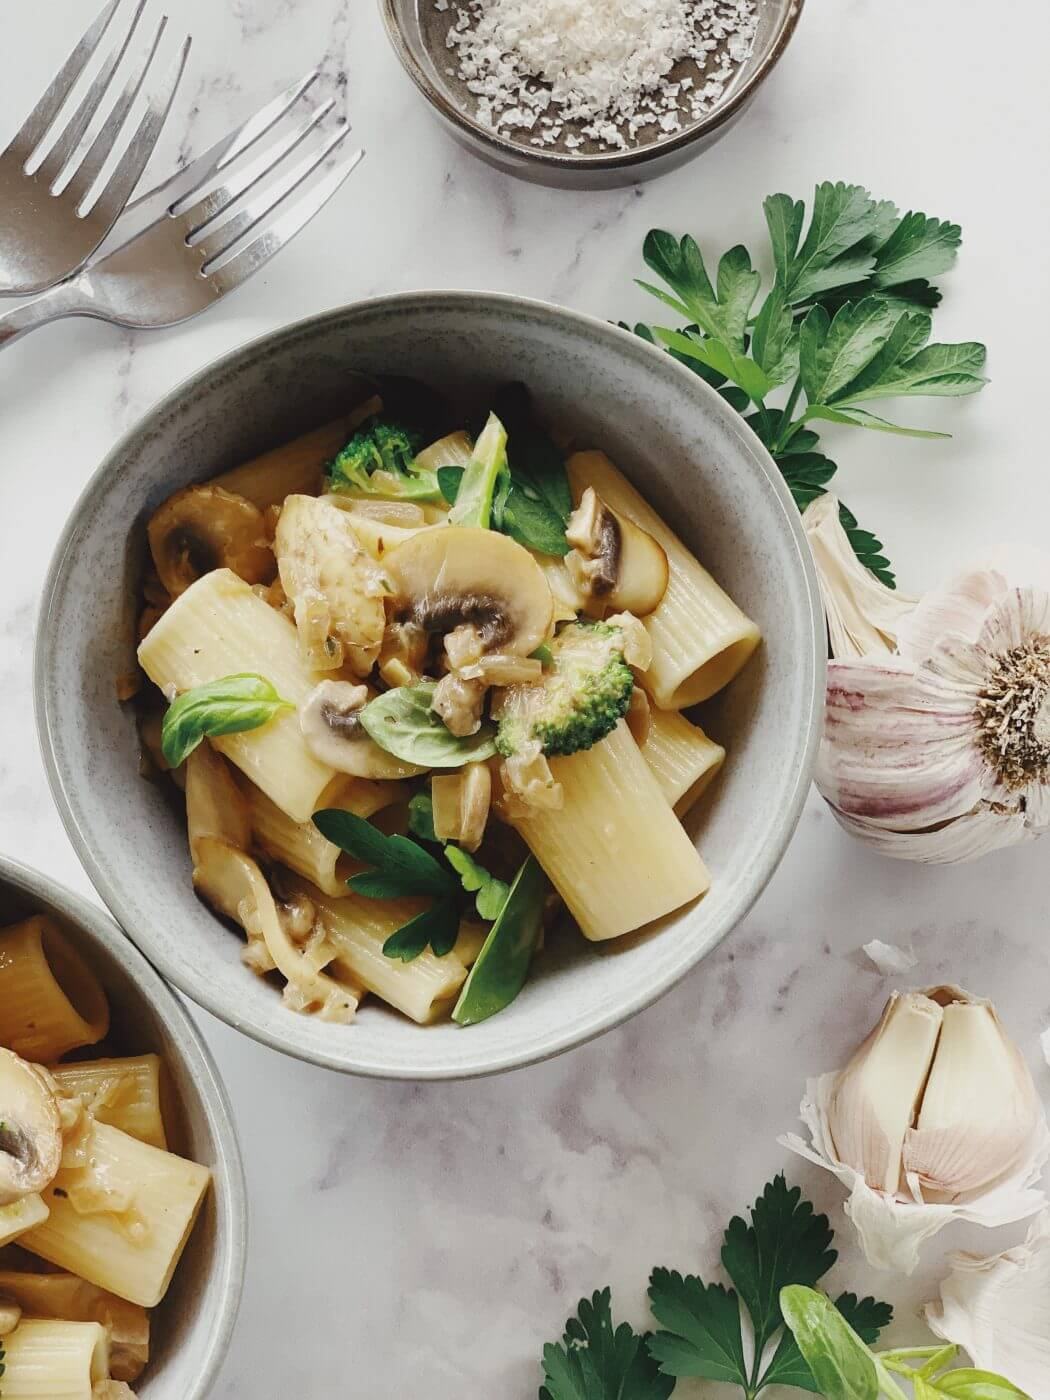 , Mushroom and Broccoli Pasta